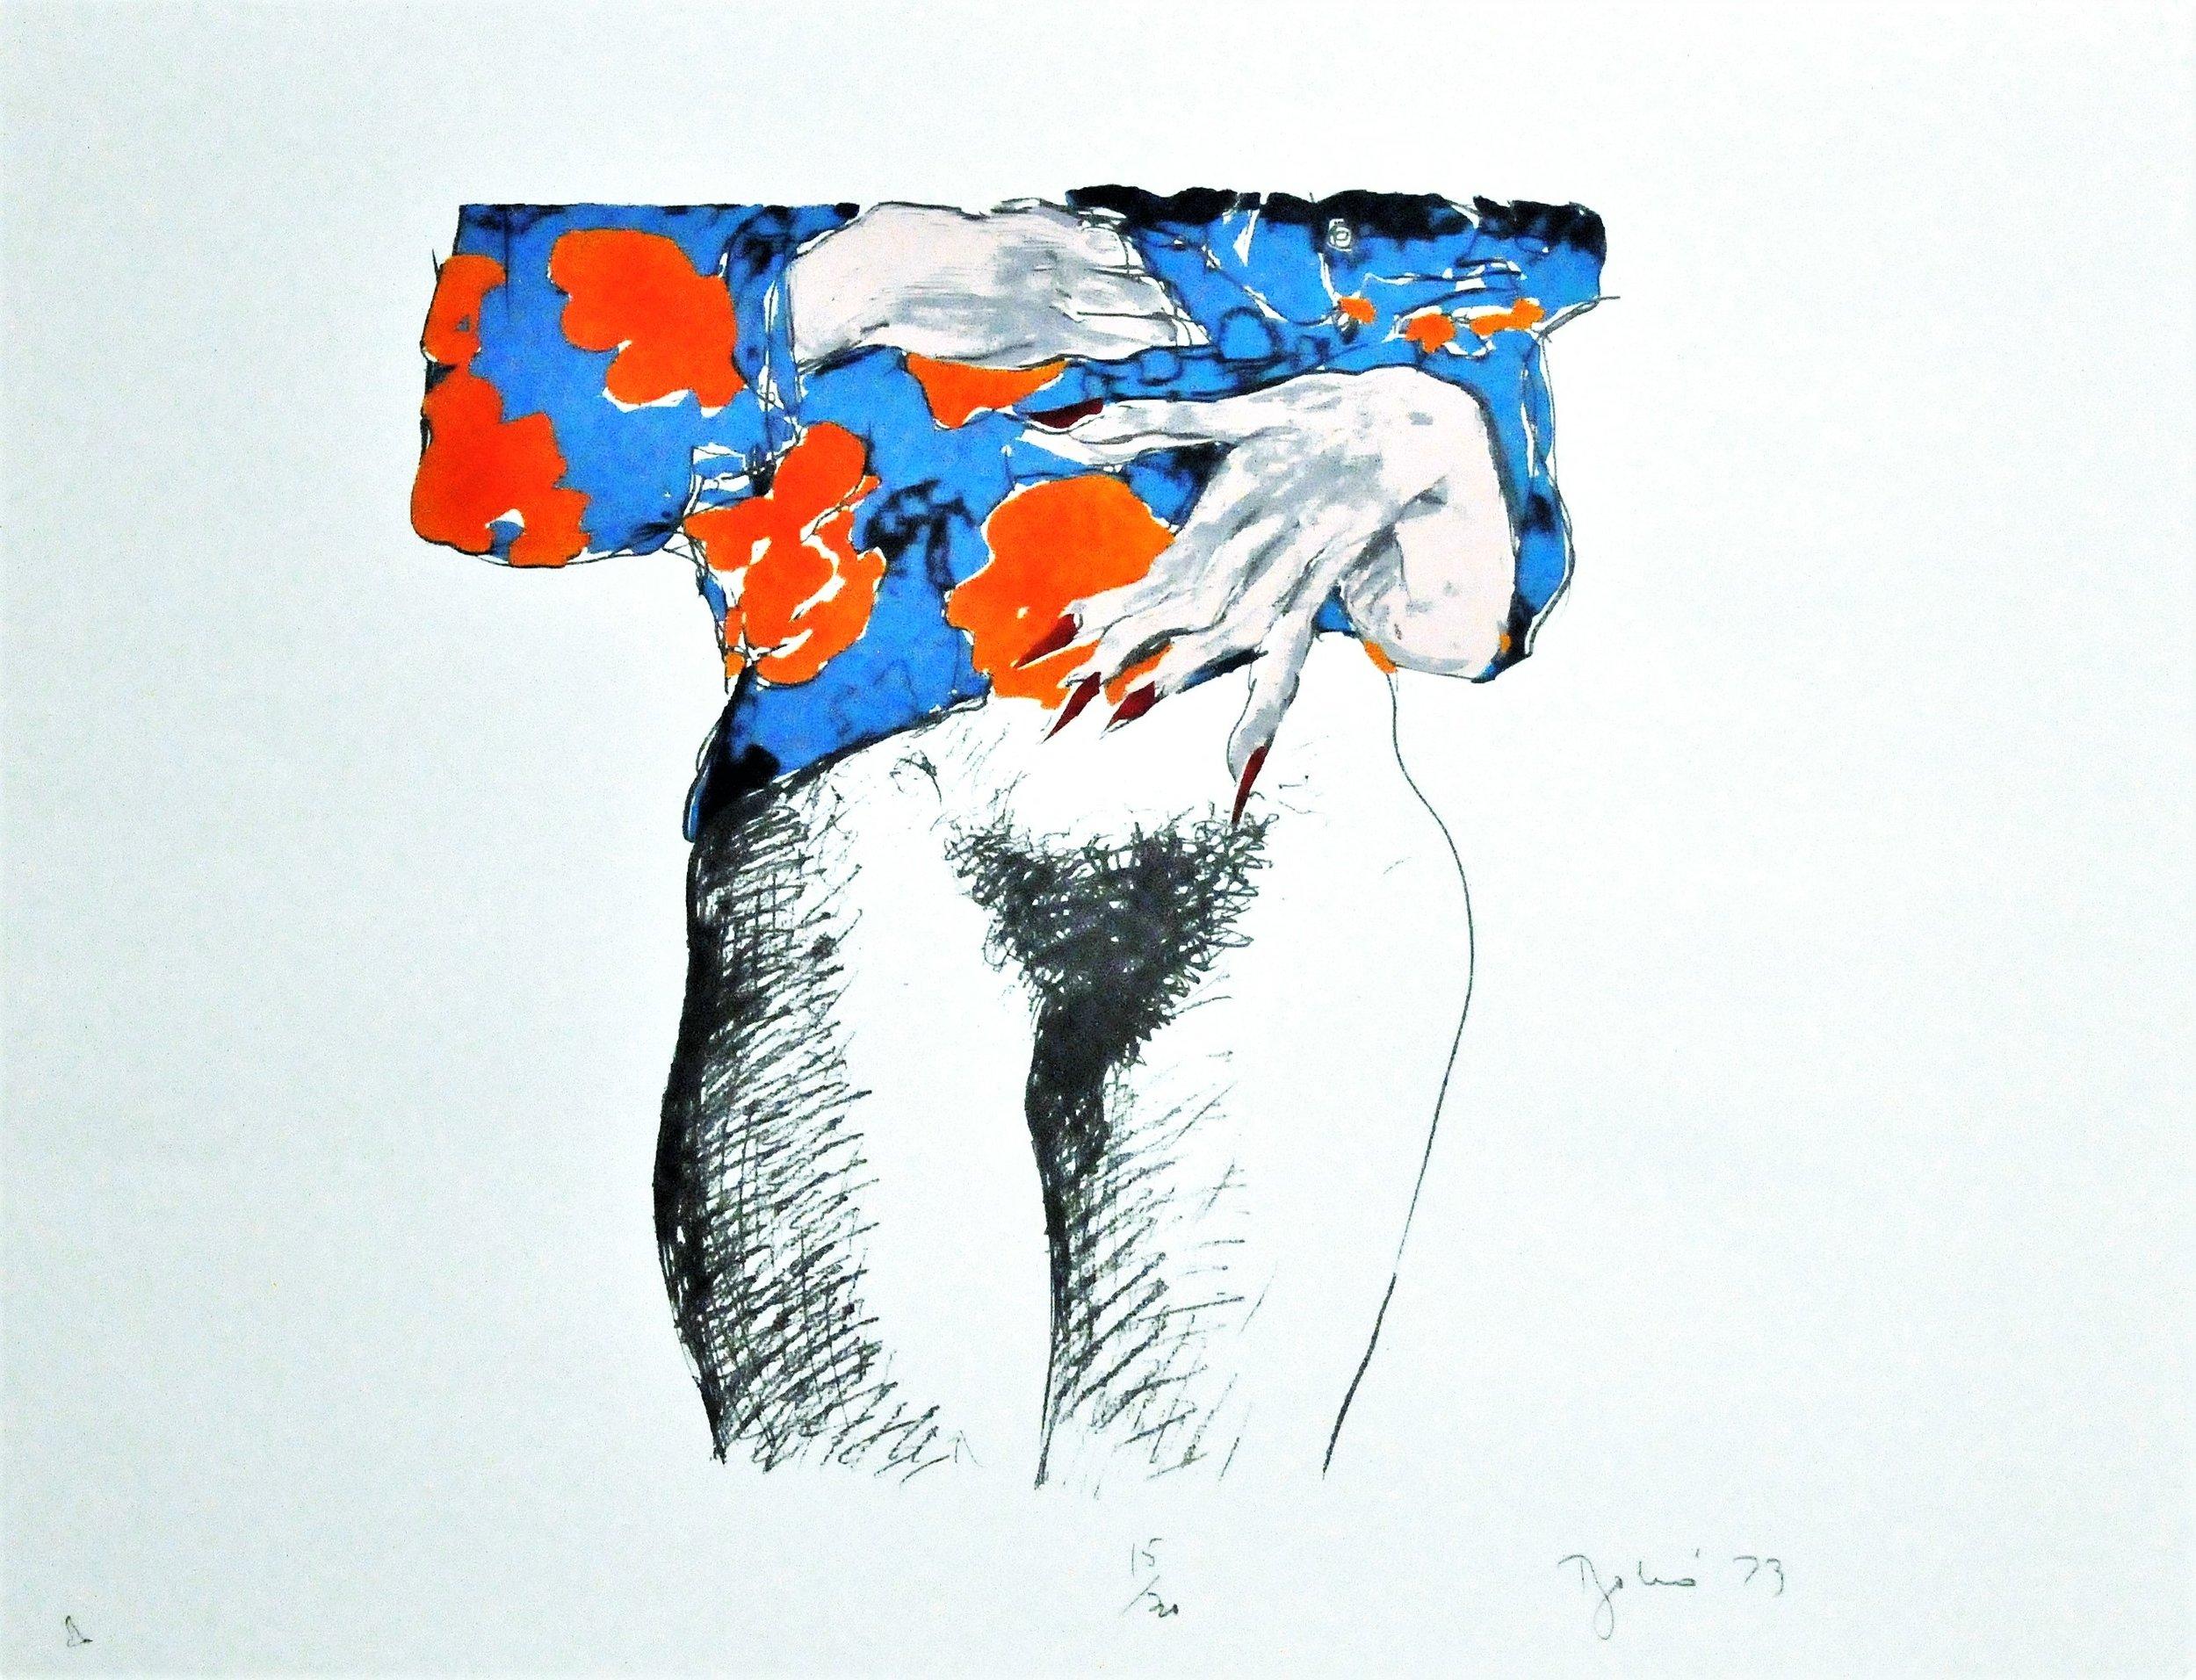 "Standing Nude, 1973, Louis Bakó, serigraph, edition 6/40, 22"" x 28"", 2008.02.10. Canada Art Council Art Bank."